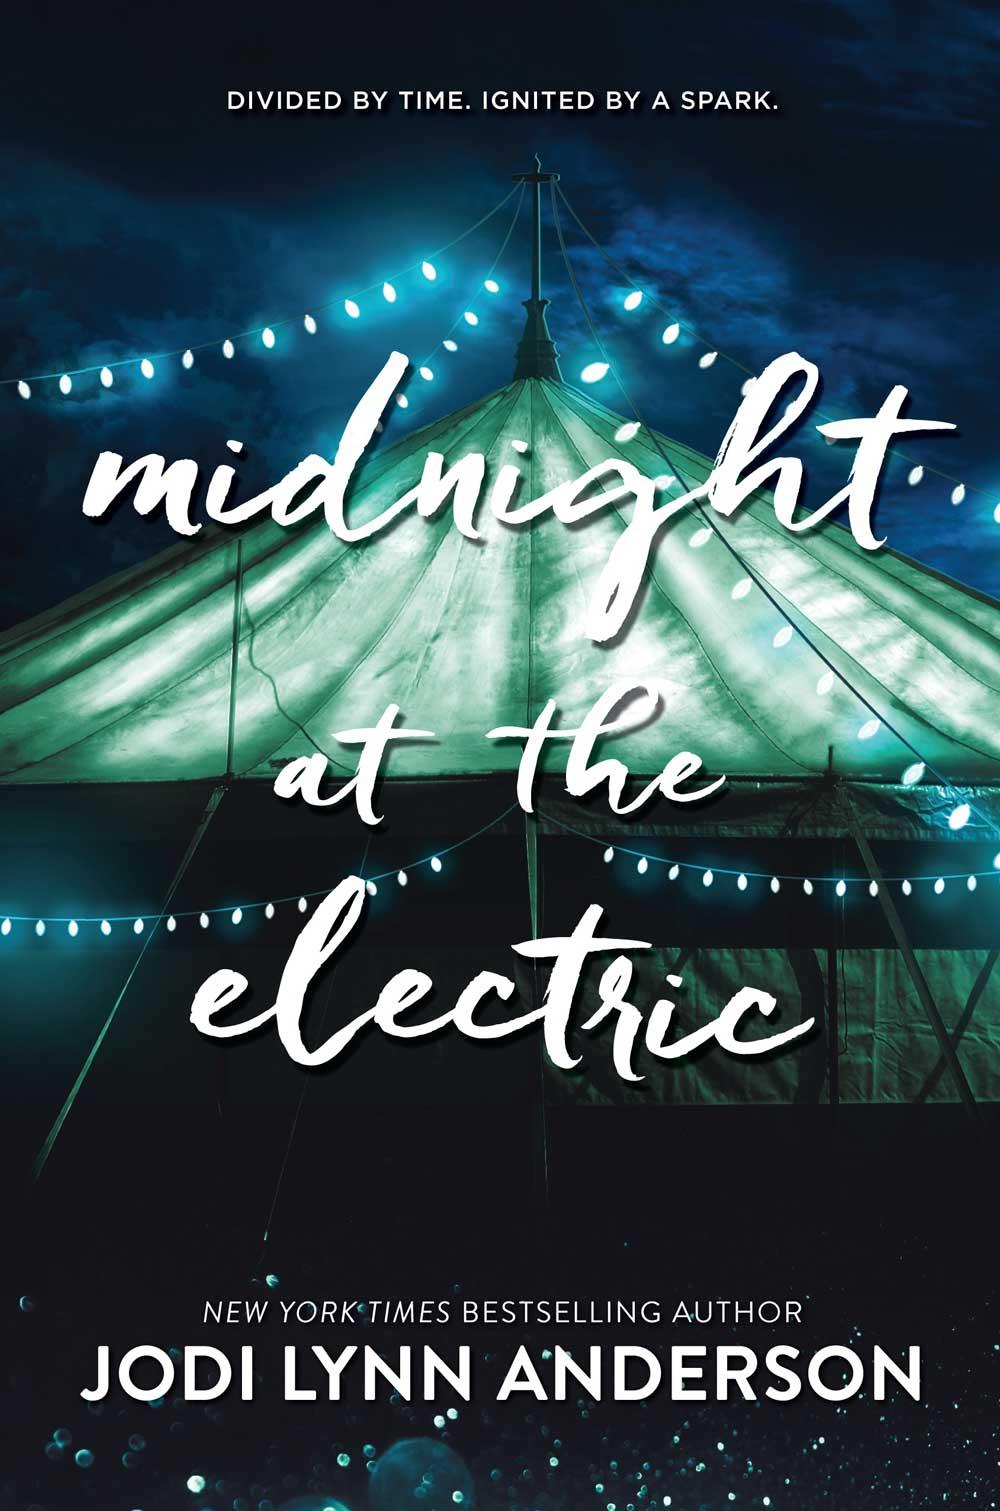 MidnightElectric-Cover.jpg